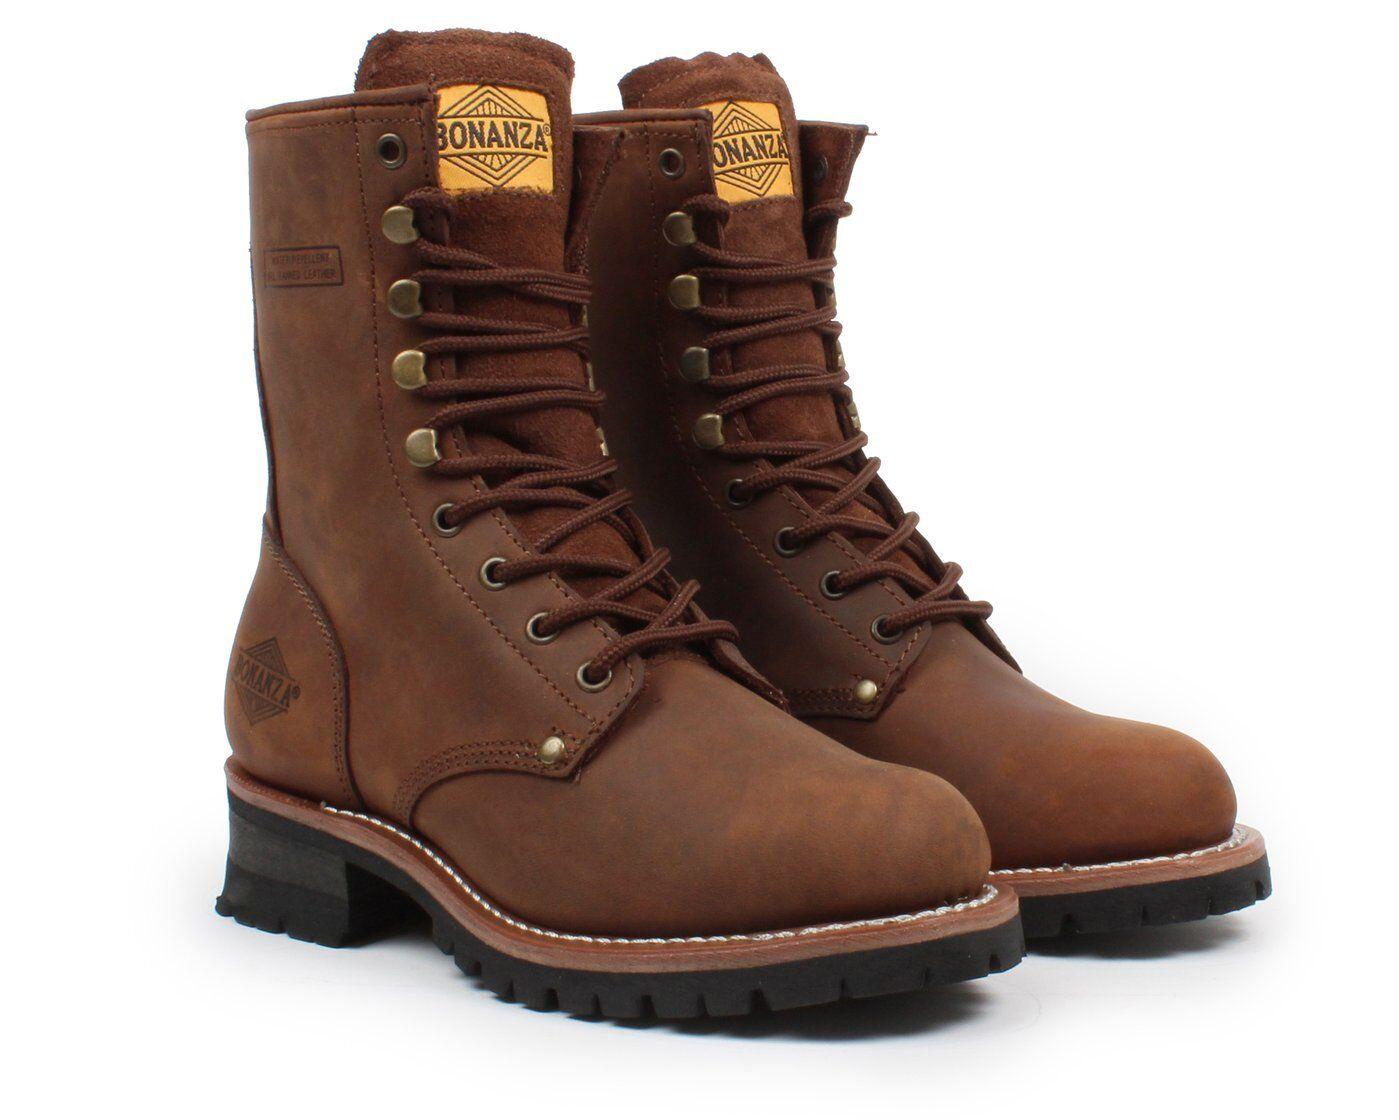 Bonanza Boots T901 Logger Goodyear Welt Construction Steel Toe Medium